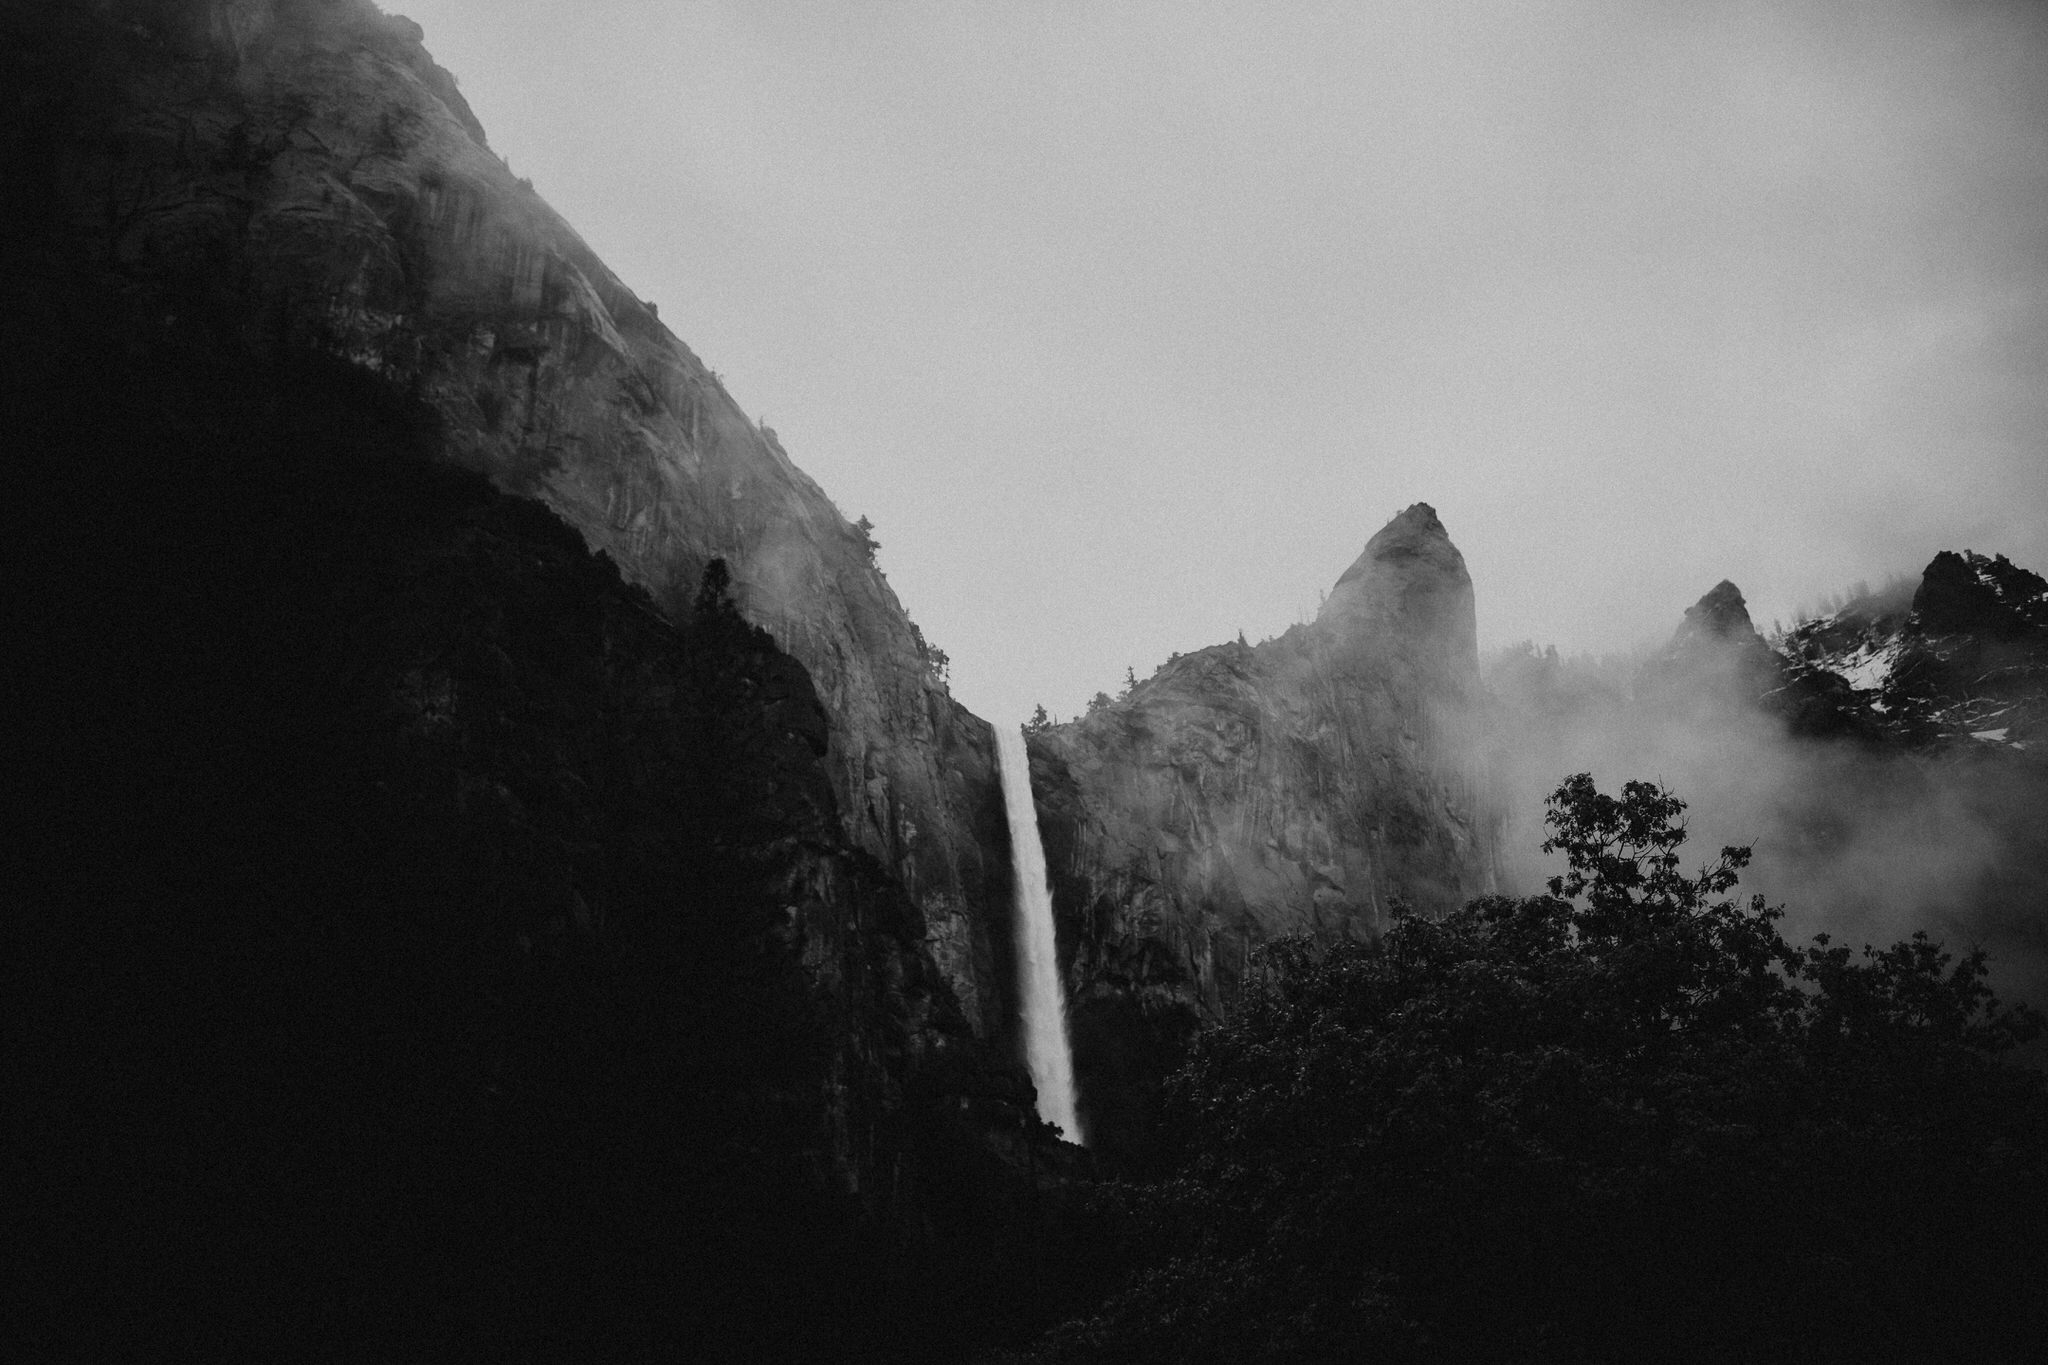 Yosemite-engagement-session-lauren-and-tom44.jpg